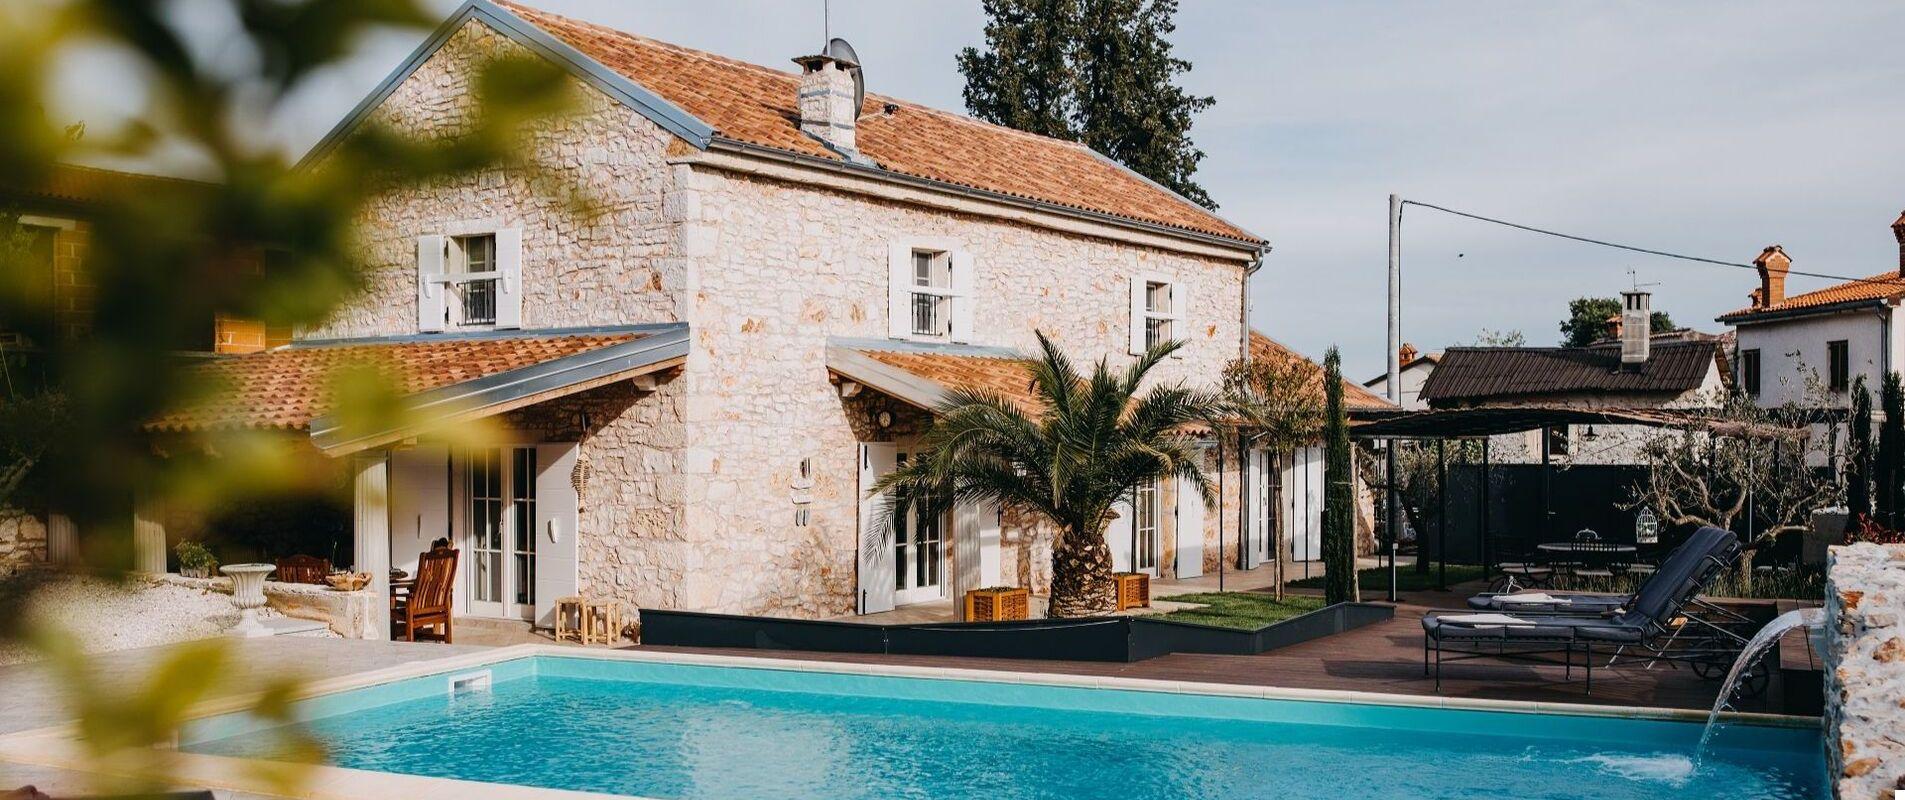 Oryginalna willa San Lorenzo z basenem